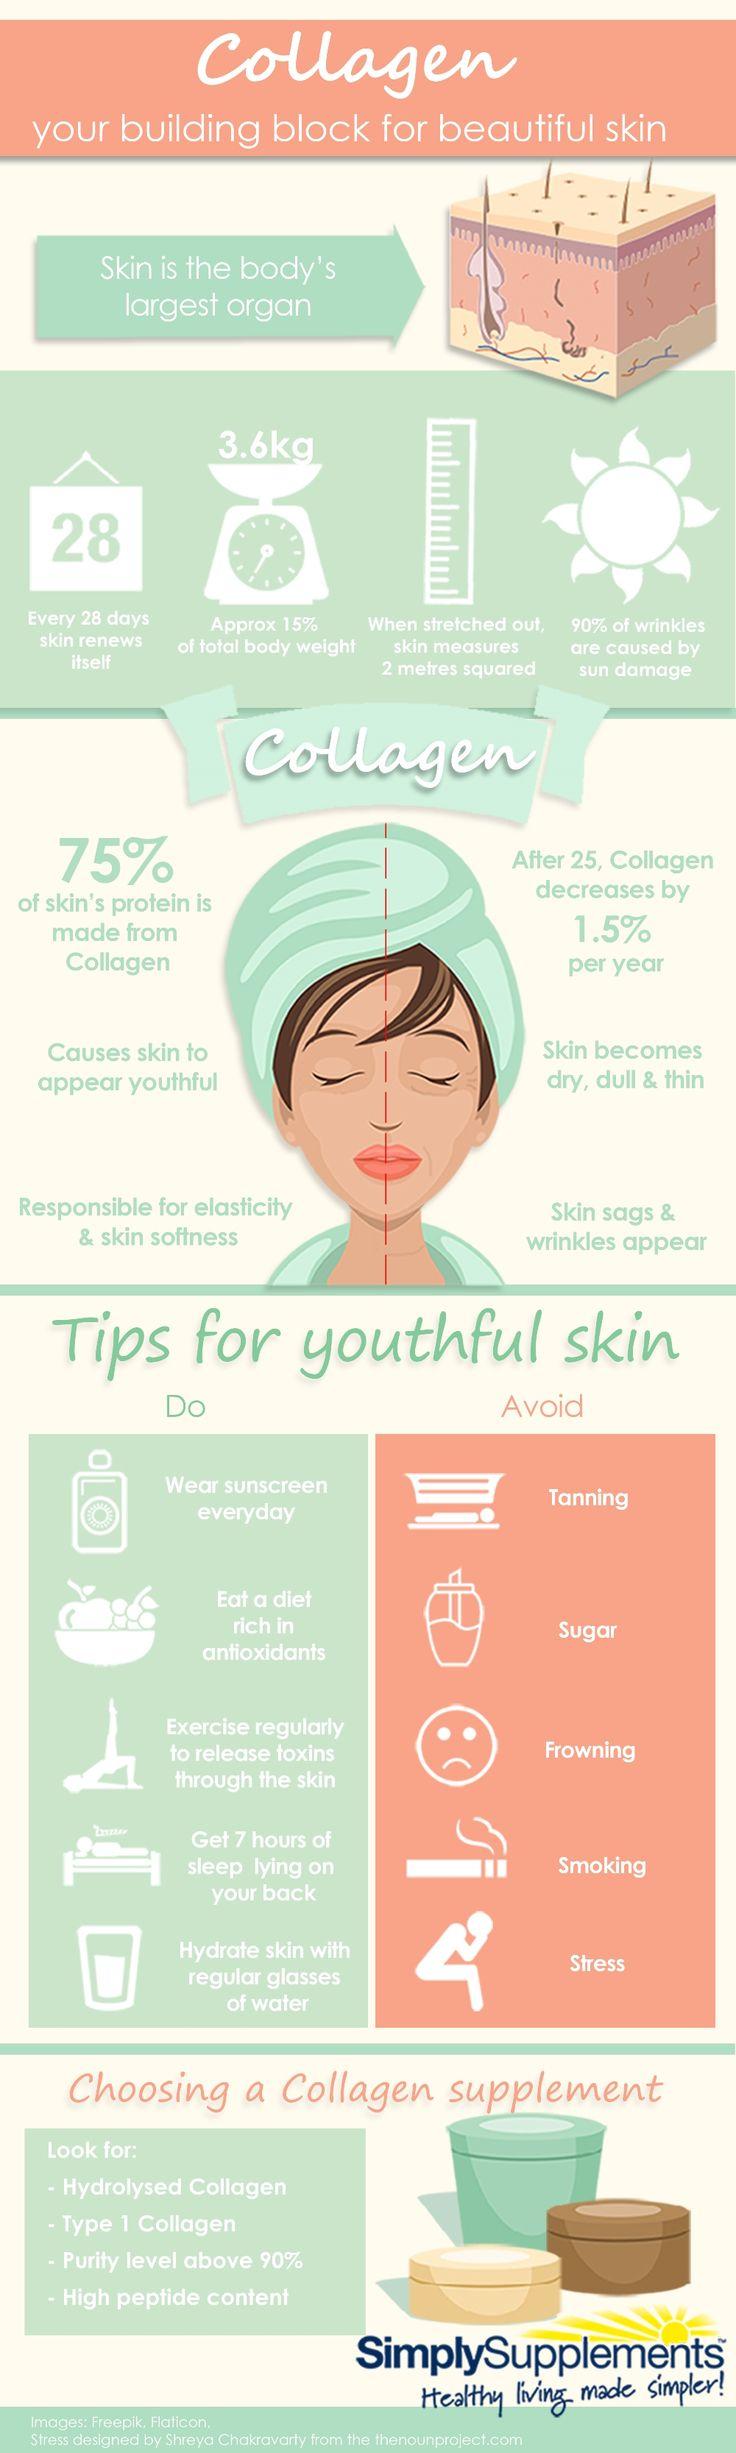 Collagen Building Block For Skin - Healthy Life